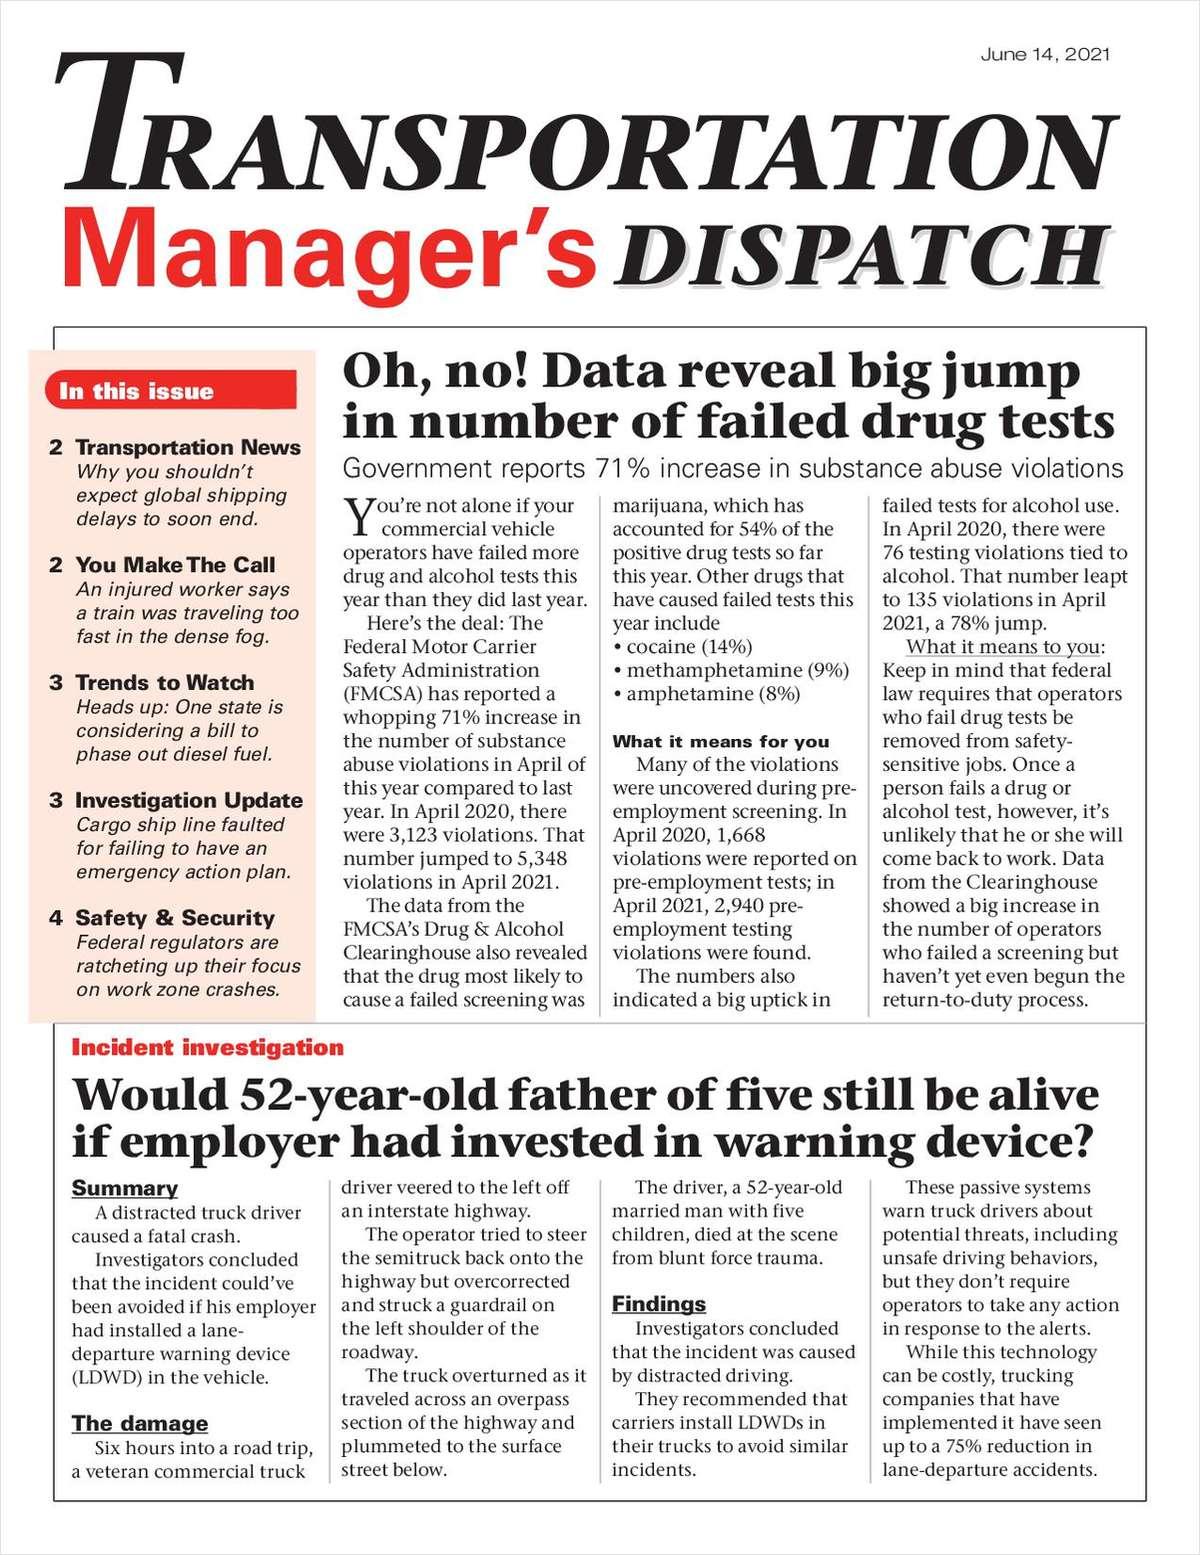 Transportation Manager's Dispatch Newsletter: June 14, 2021, Issue